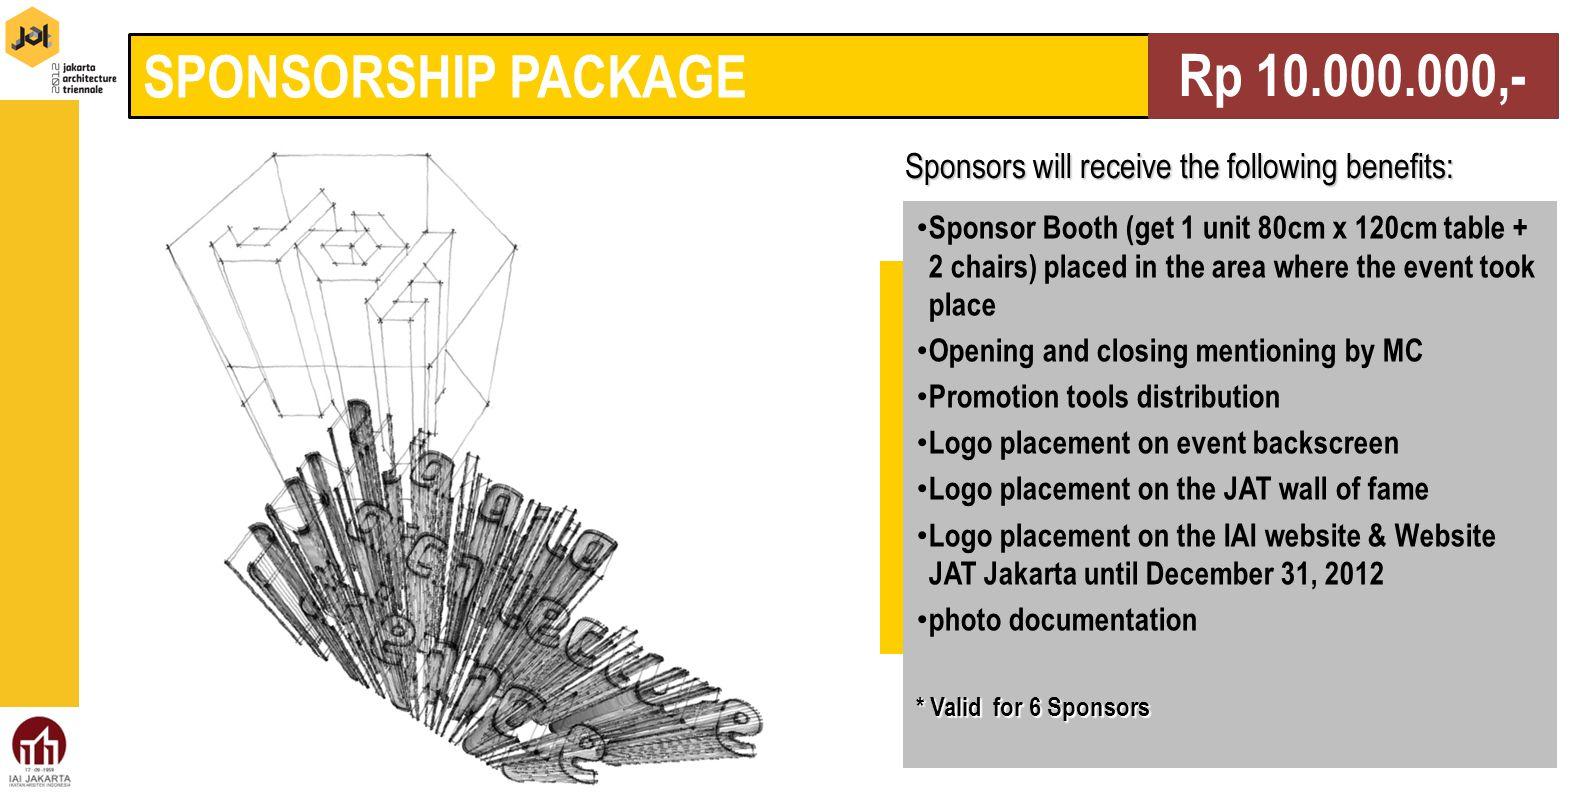 SPONSORSHIP PACKAGE Rp 10.000.000,-